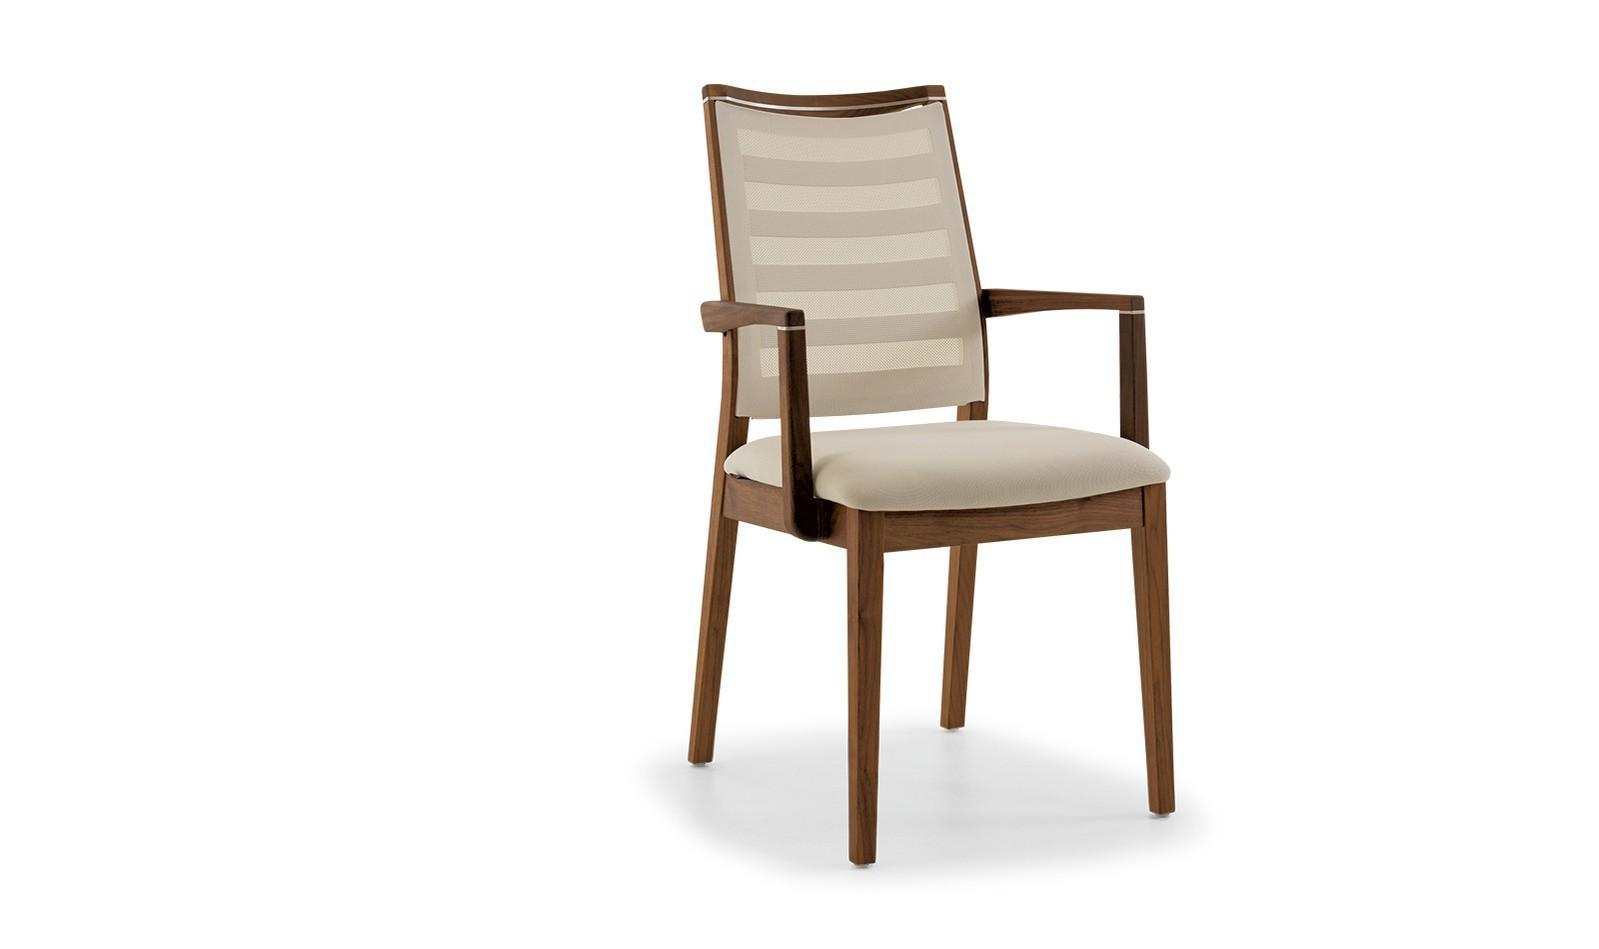 venjakob stuhl sessel antonia 3062 85 tritex kernbuche ge lt. Black Bedroom Furniture Sets. Home Design Ideas